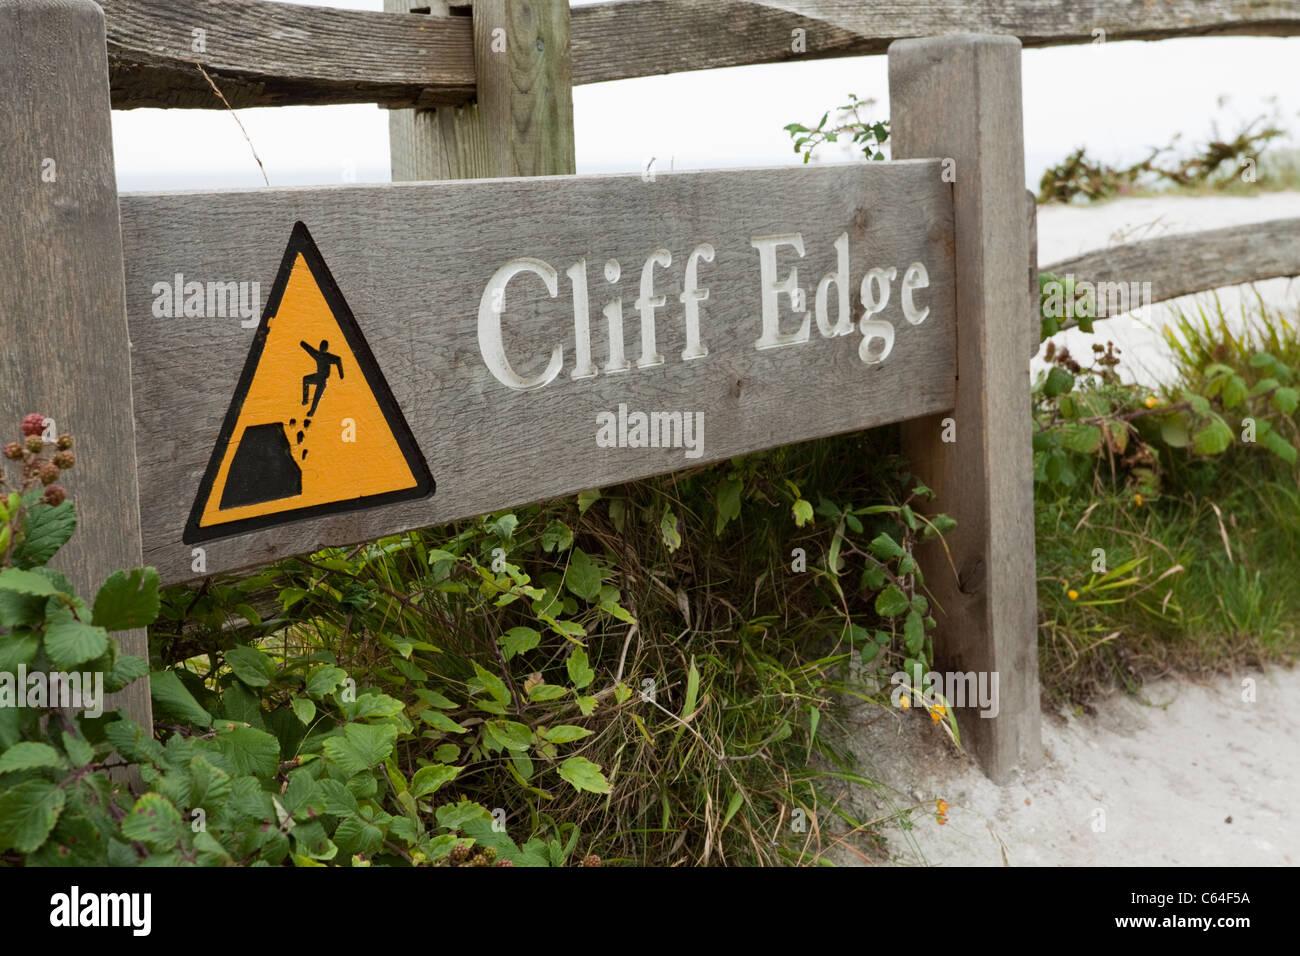 Cliff edge warning sign, Eastbourne, East Sussex, England, UK - Stock Image